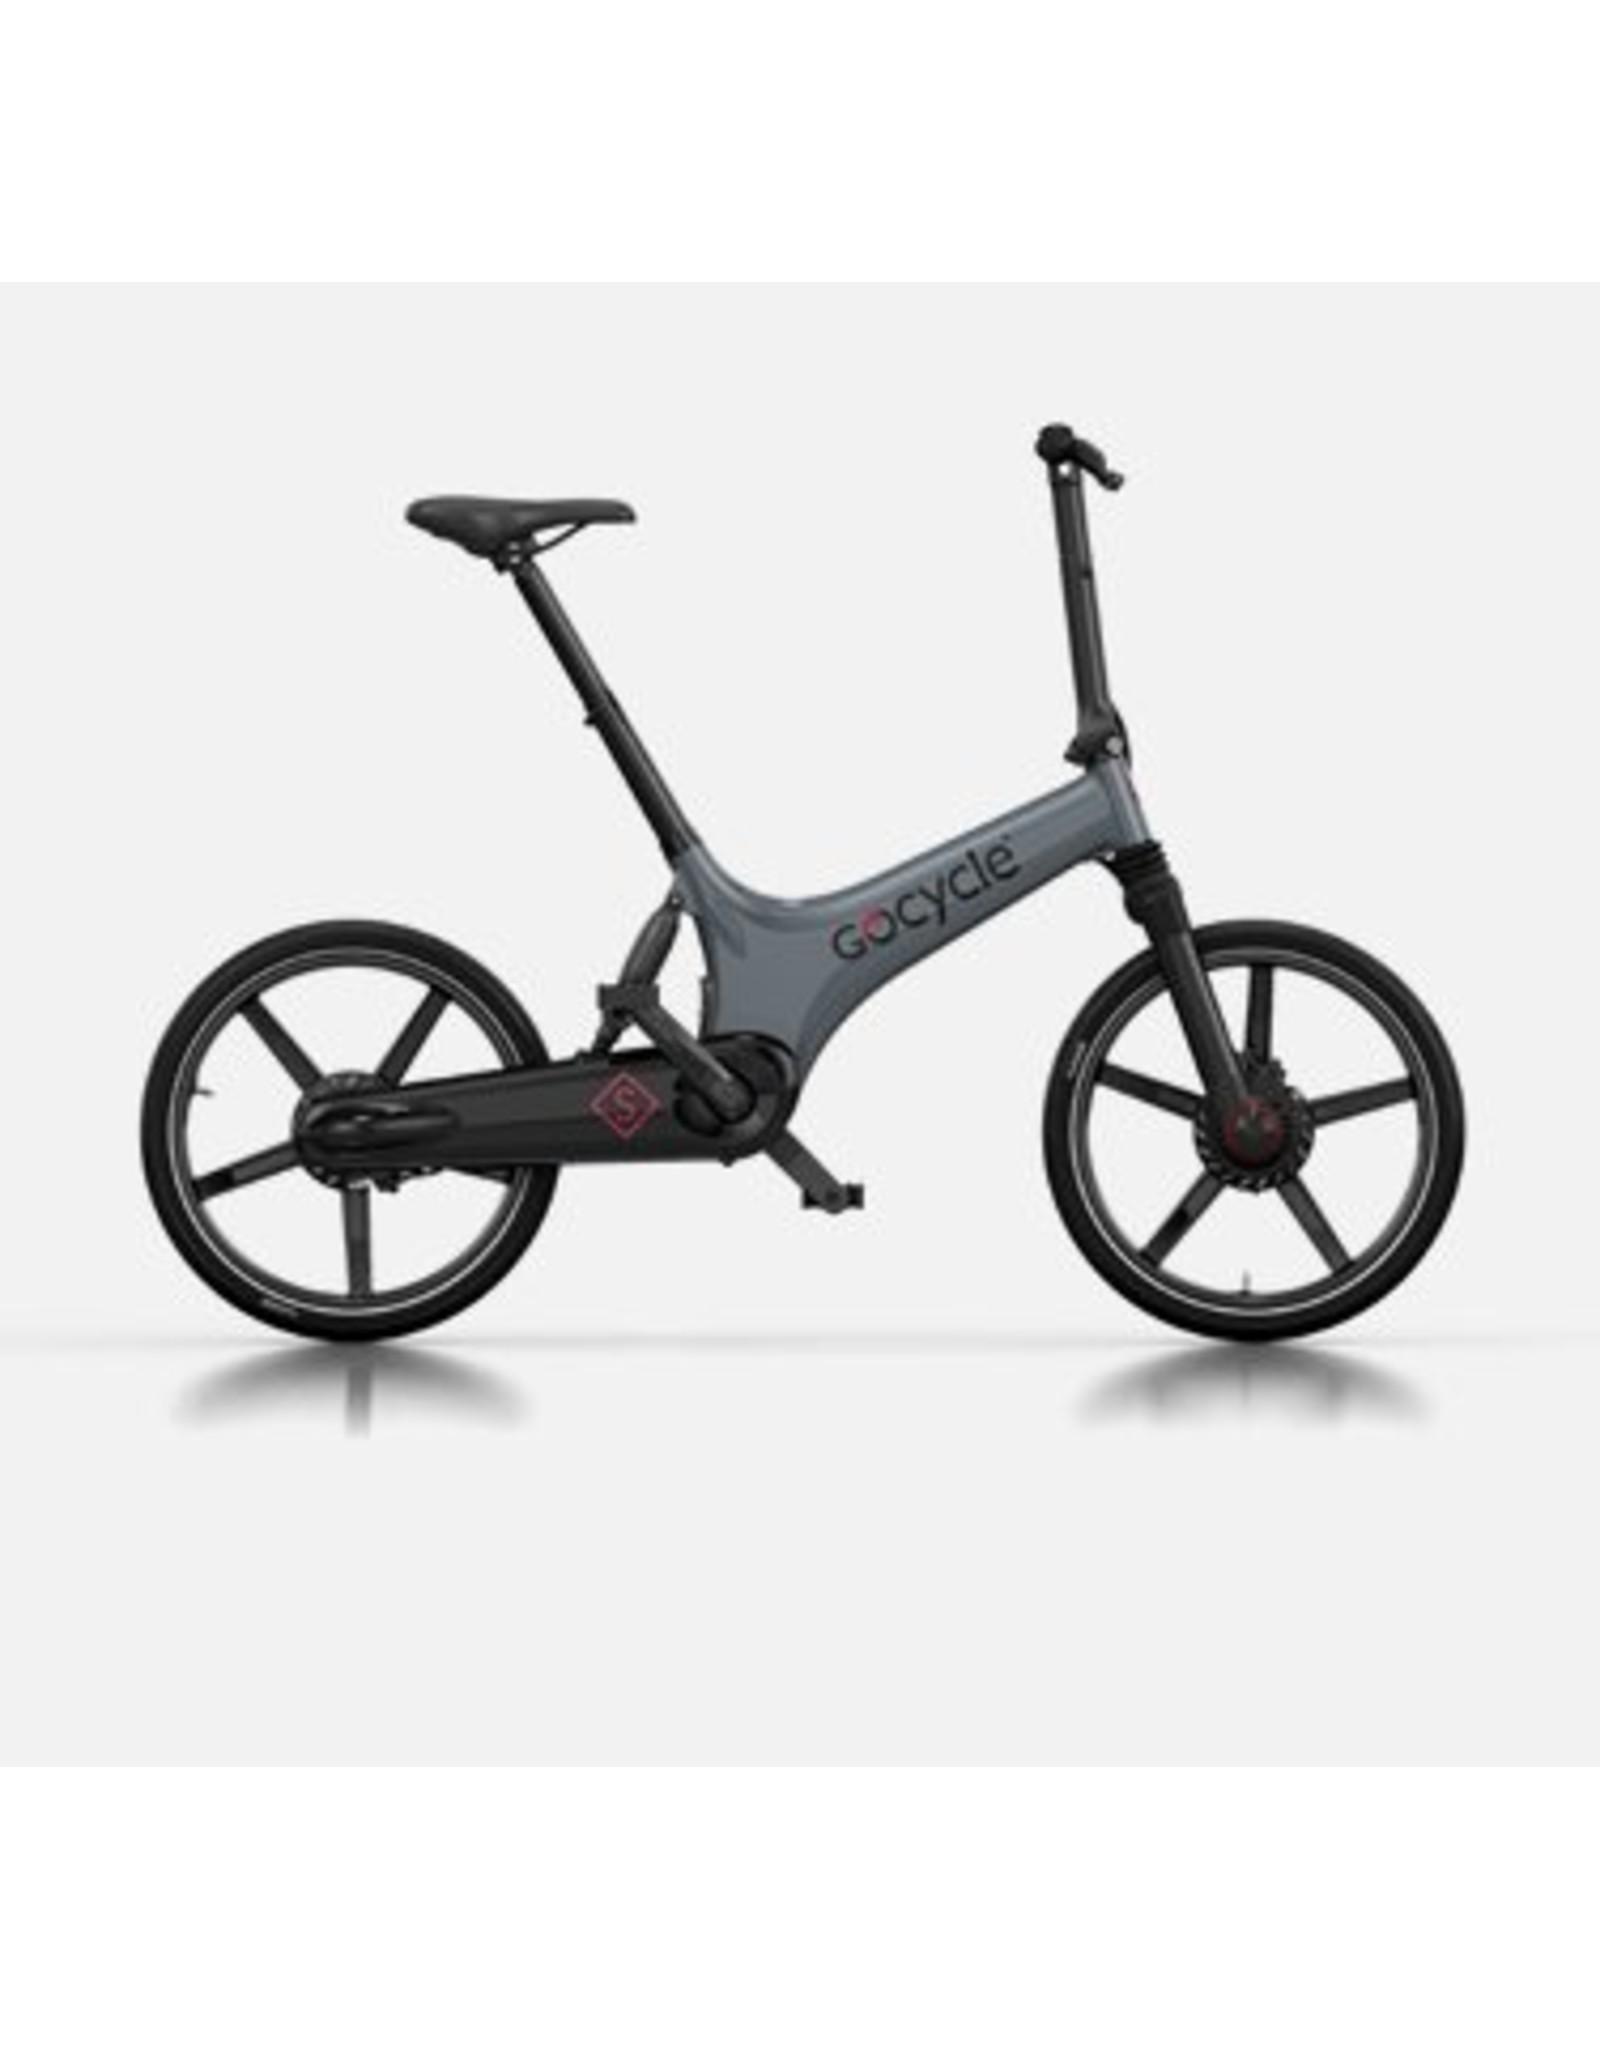 GoCycle Gocycle GS